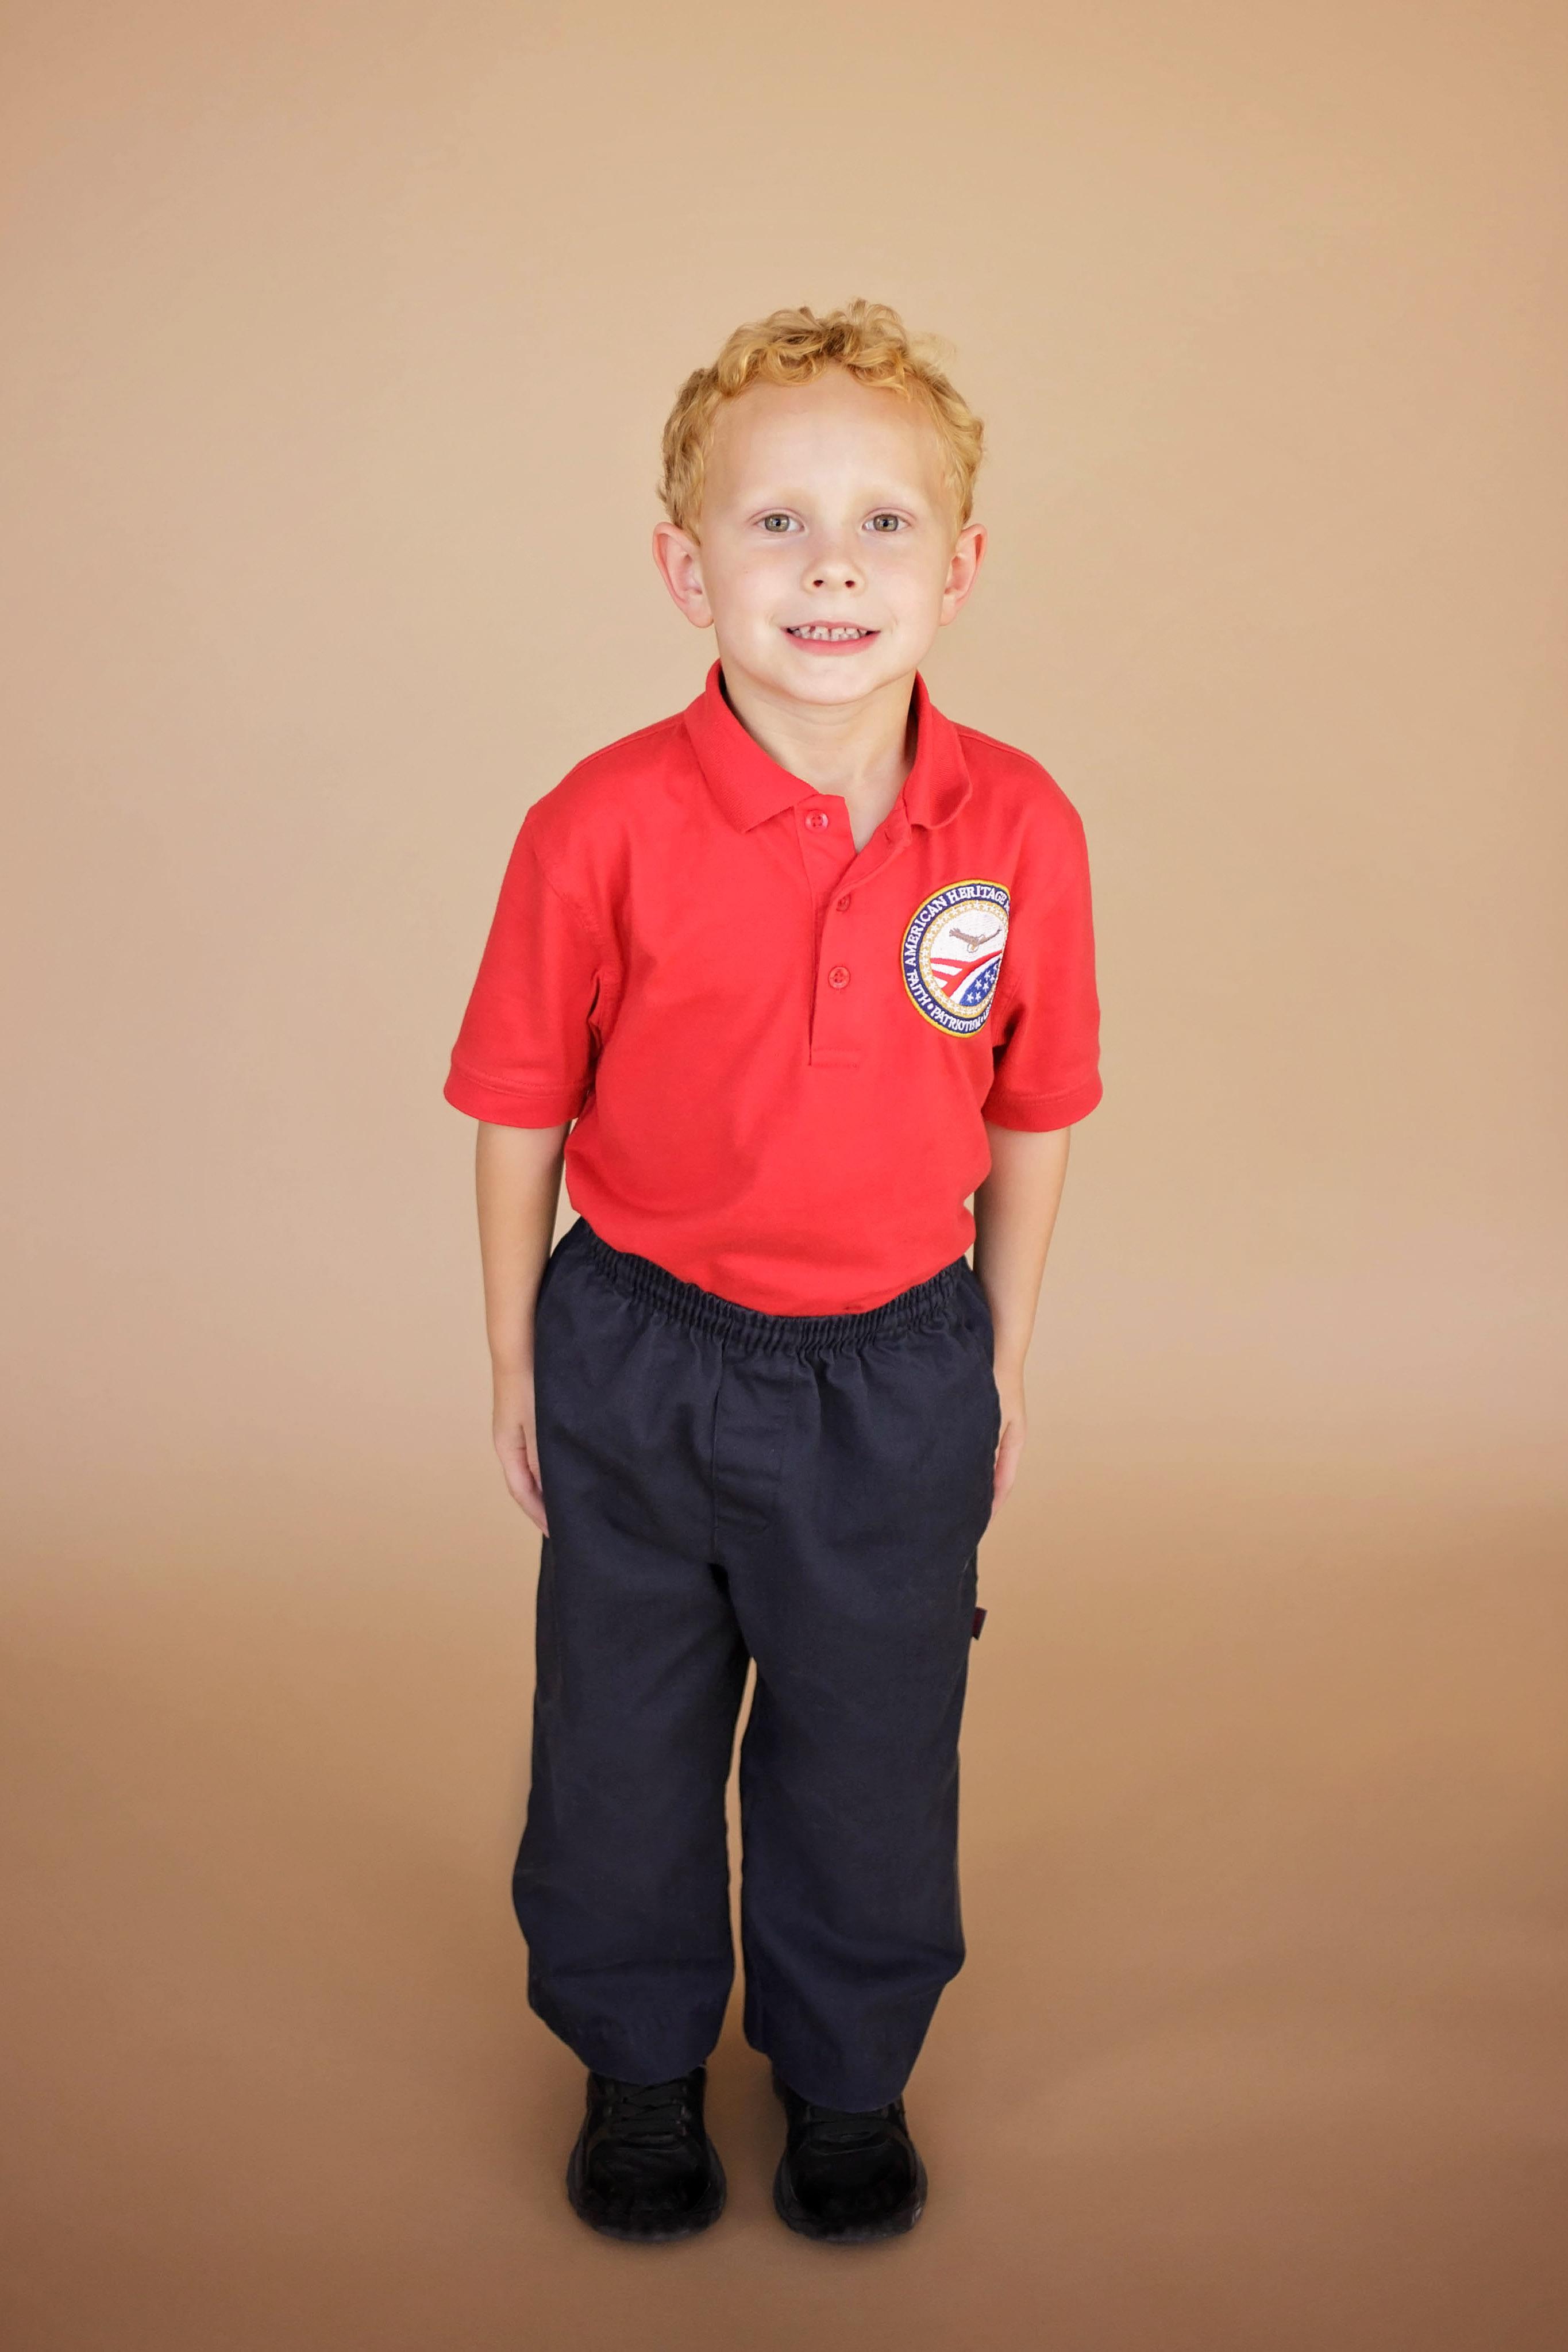 Dress Code « American Heritage Academy